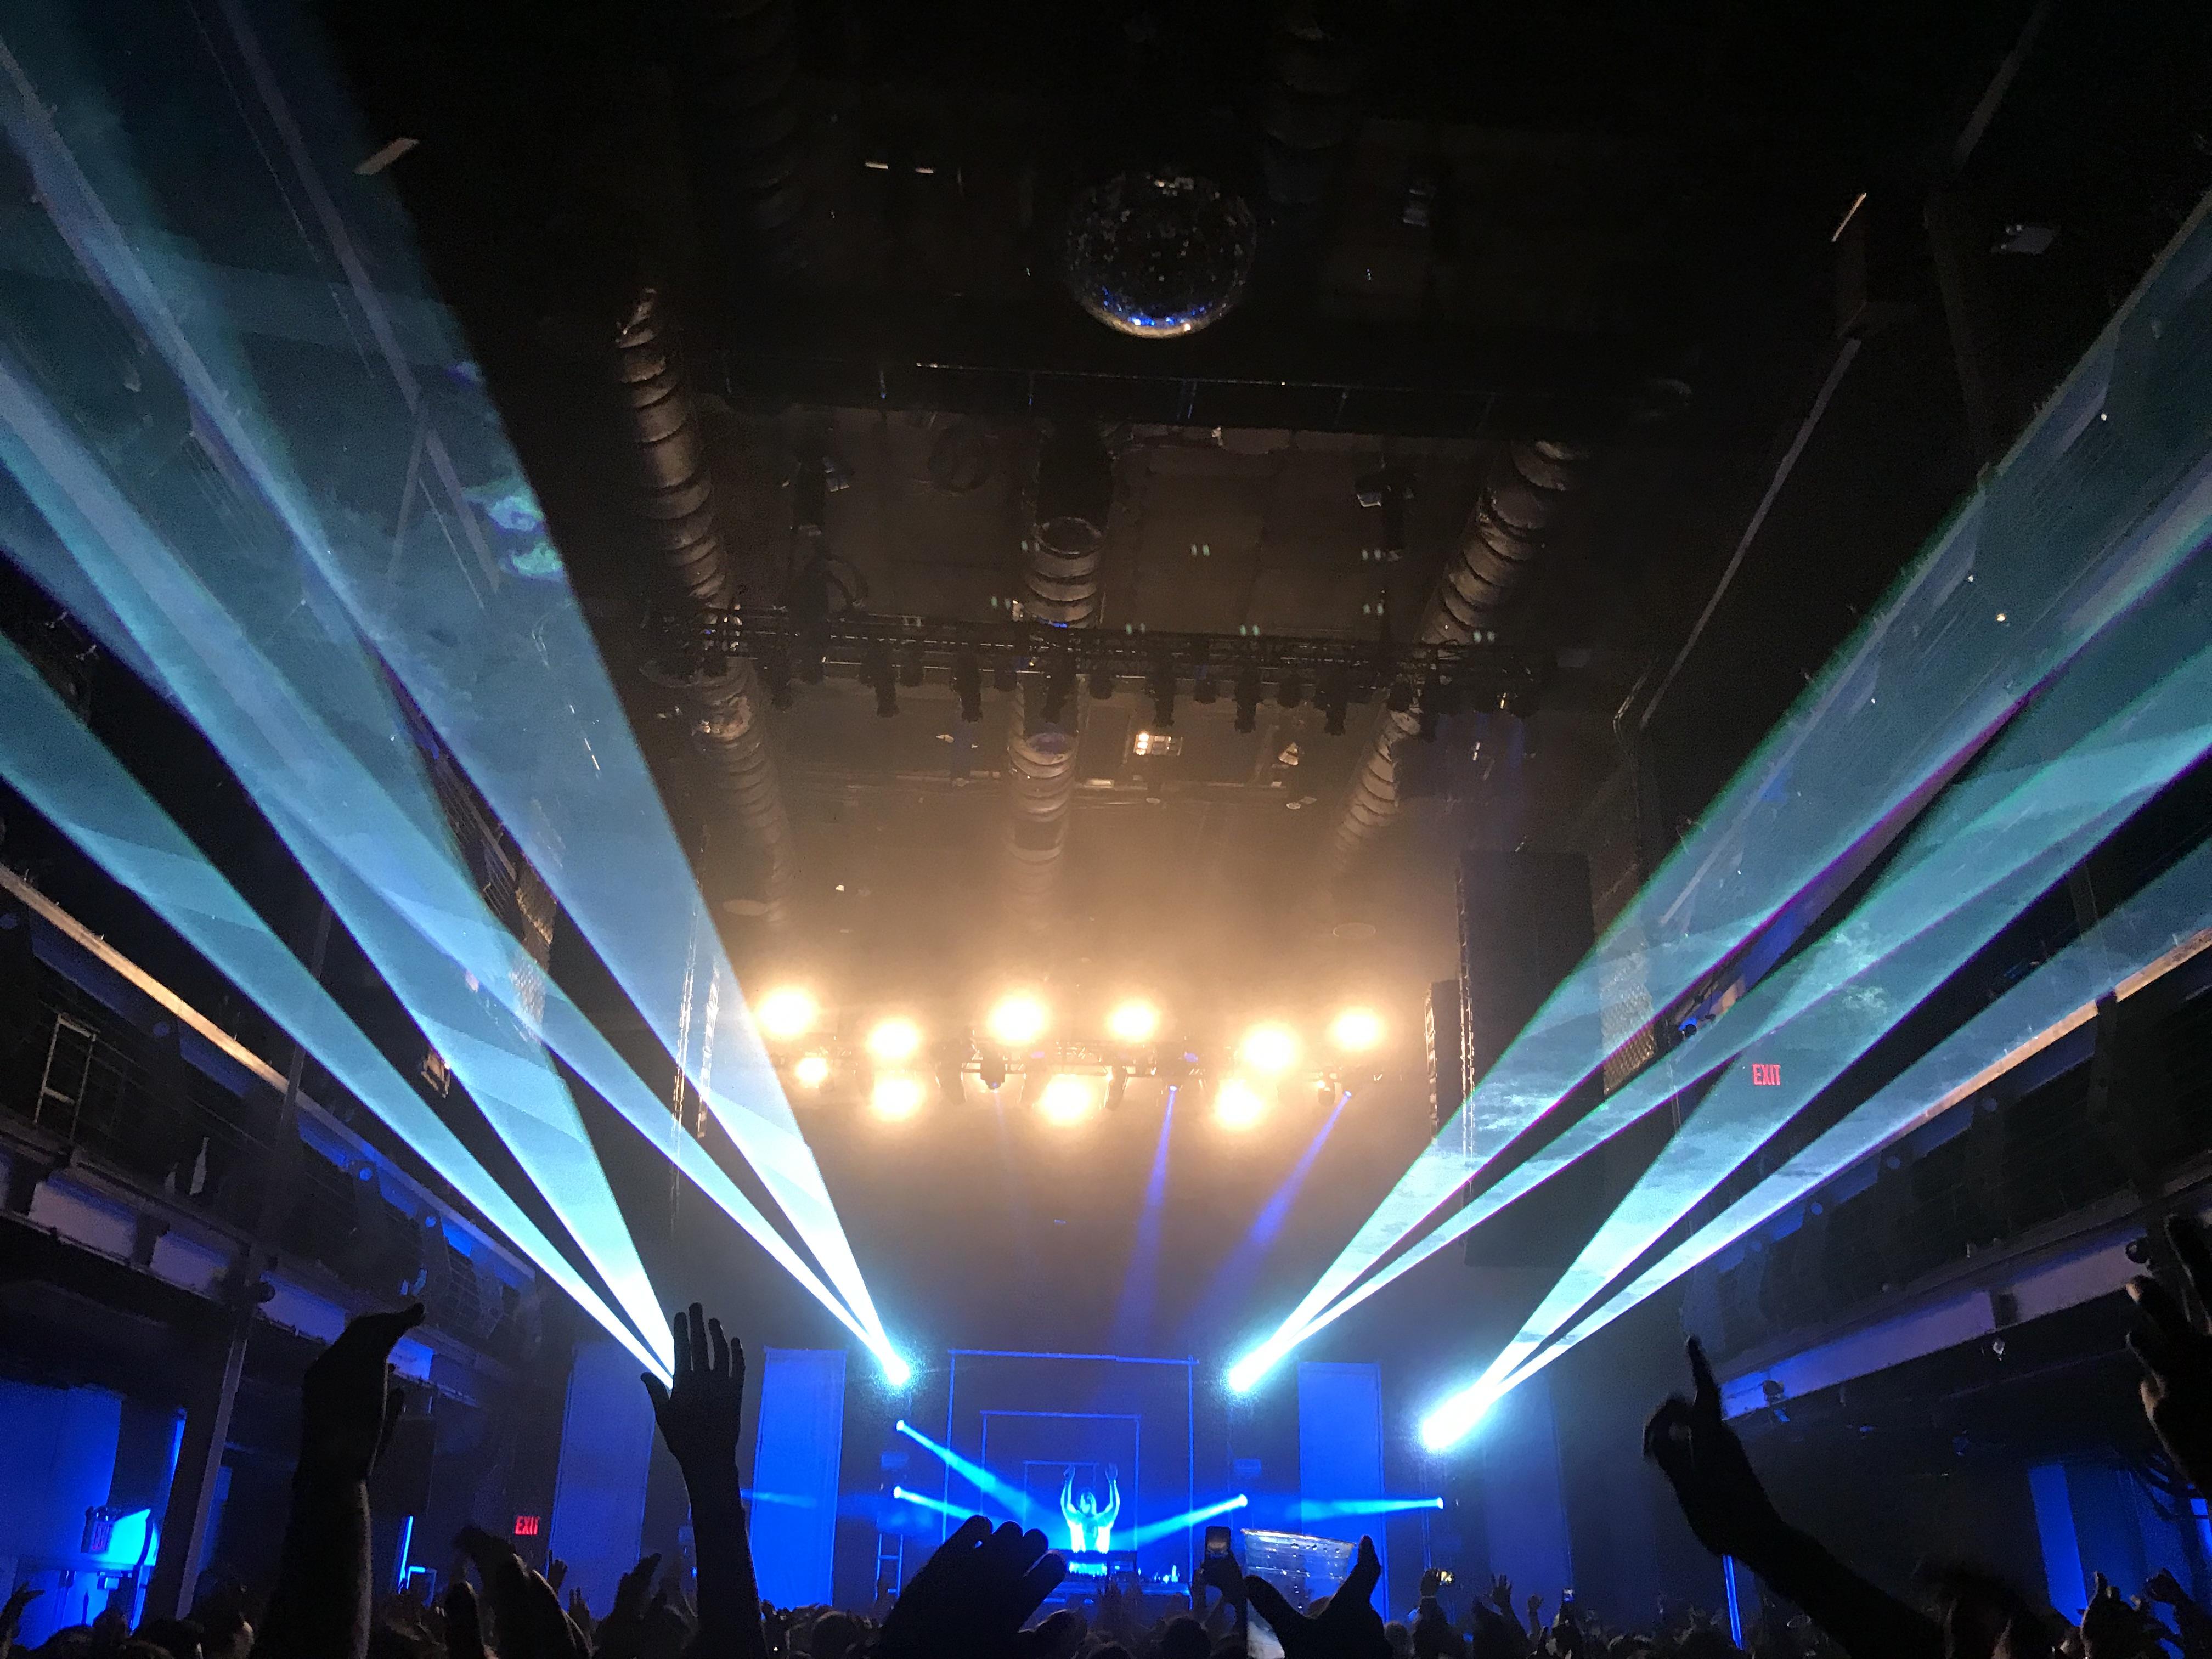 Franklin Music Hall Bright Concert Laser